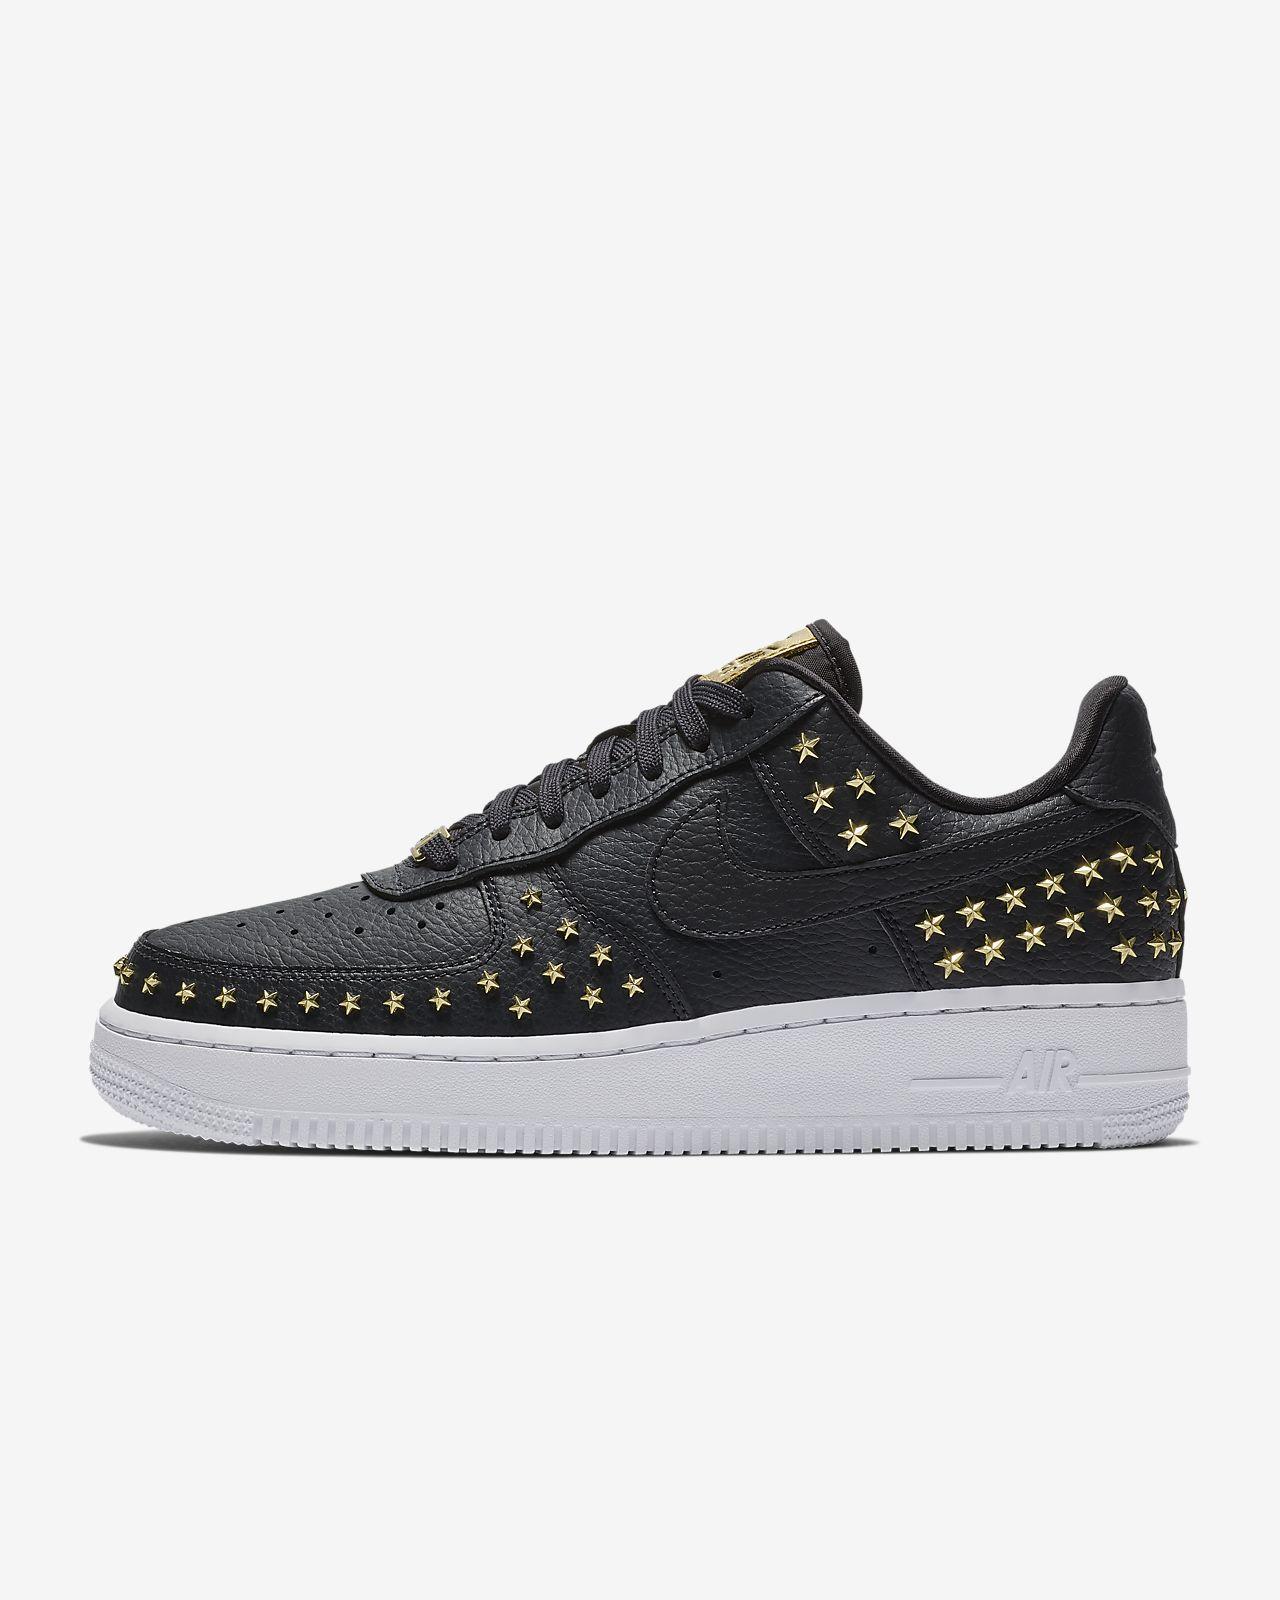 online retailer 20b72 cfa2b ... Calzado para mujer Nike Air Force 1  07 XX Studded